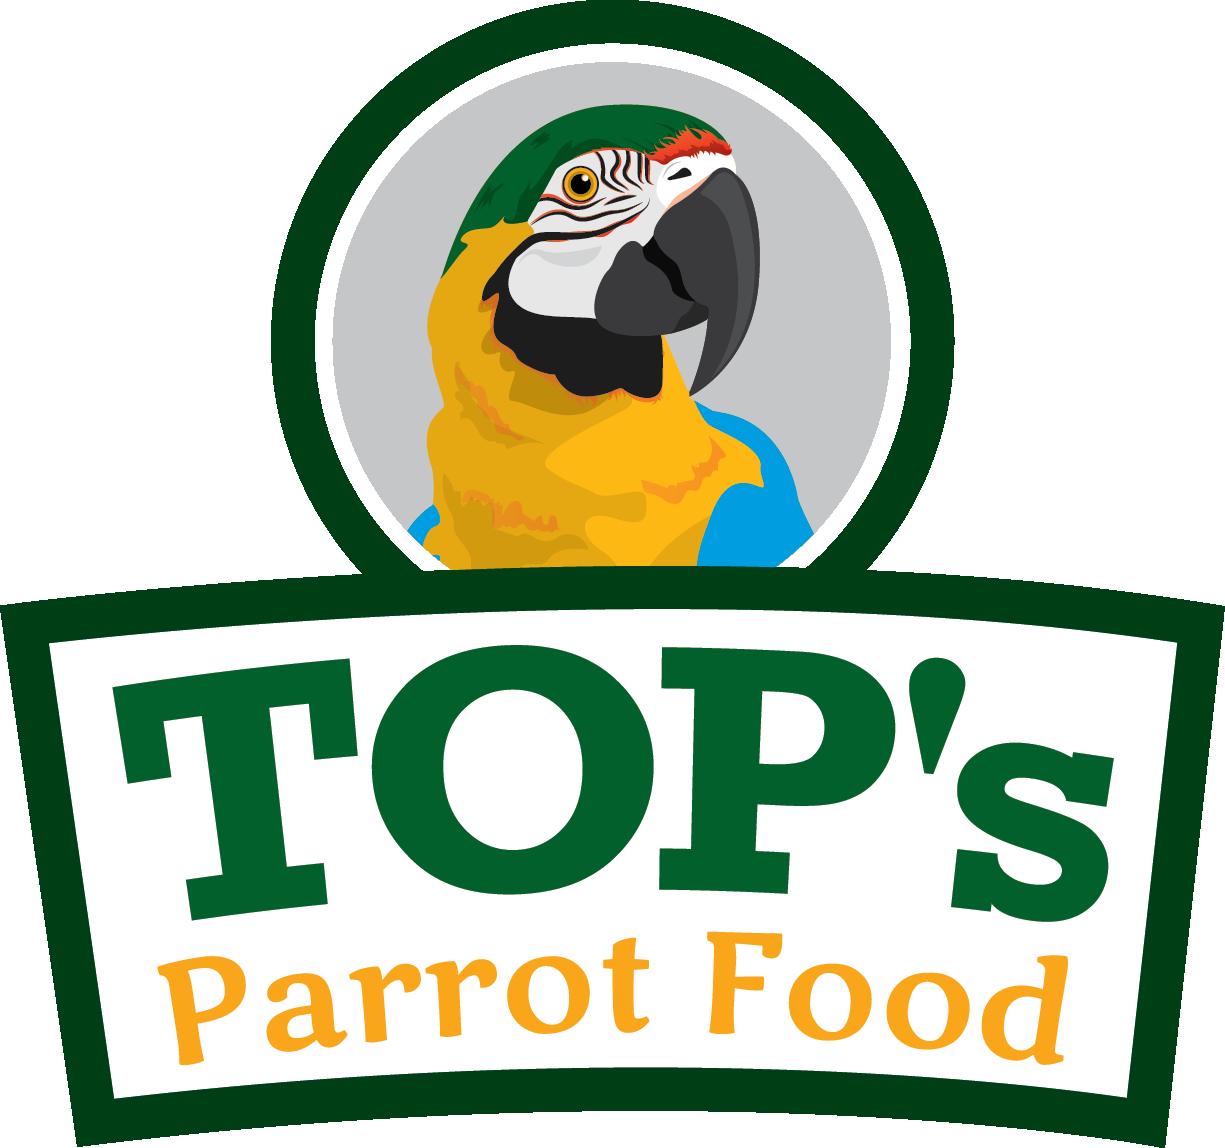 Rainforest clipart macaw. Parrot food birdsafe store